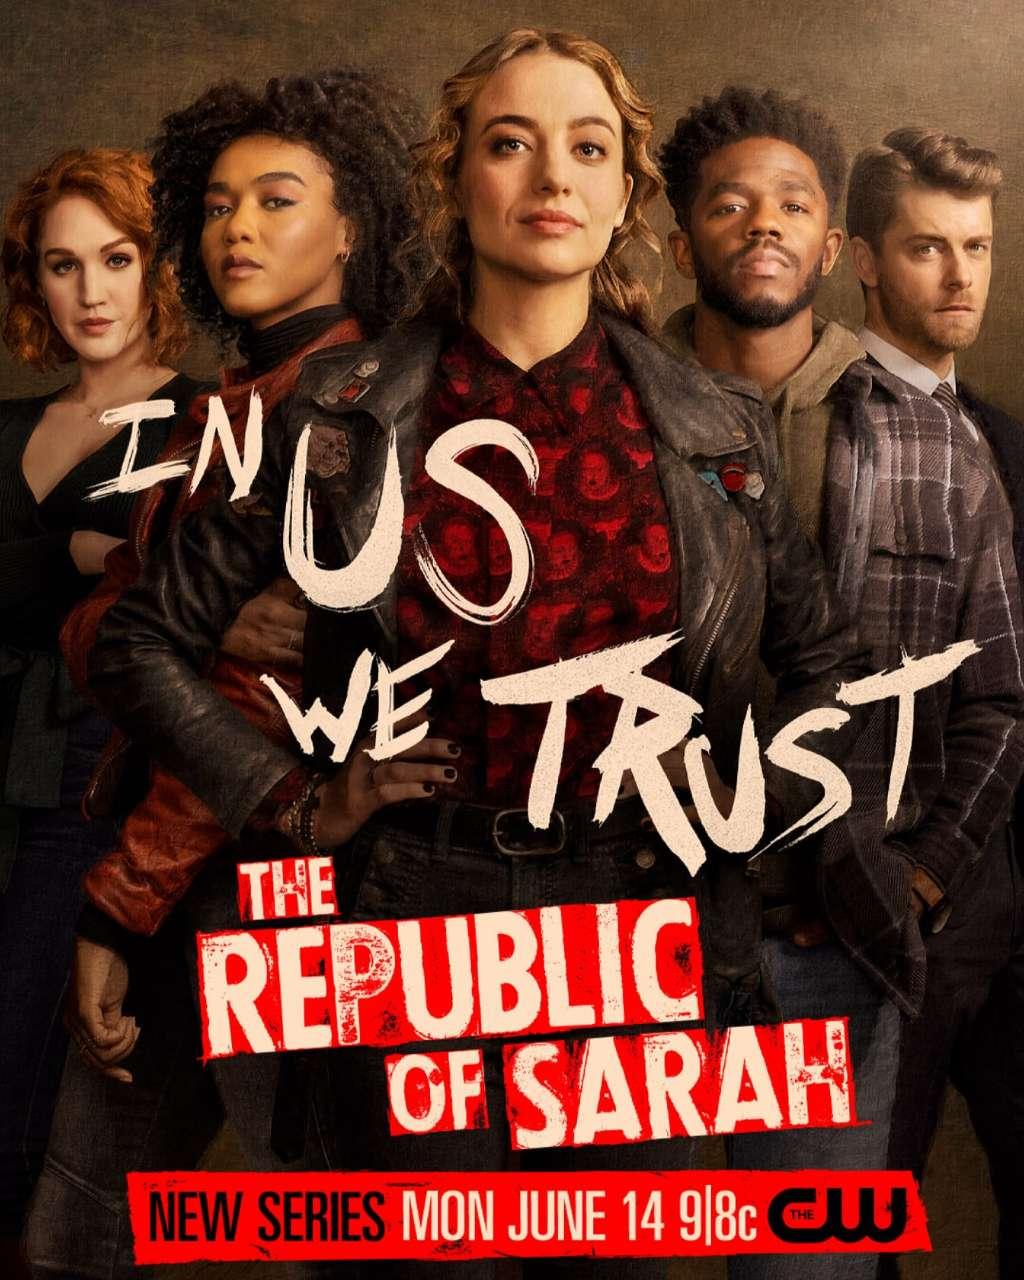 The Republic of Sarah kapak